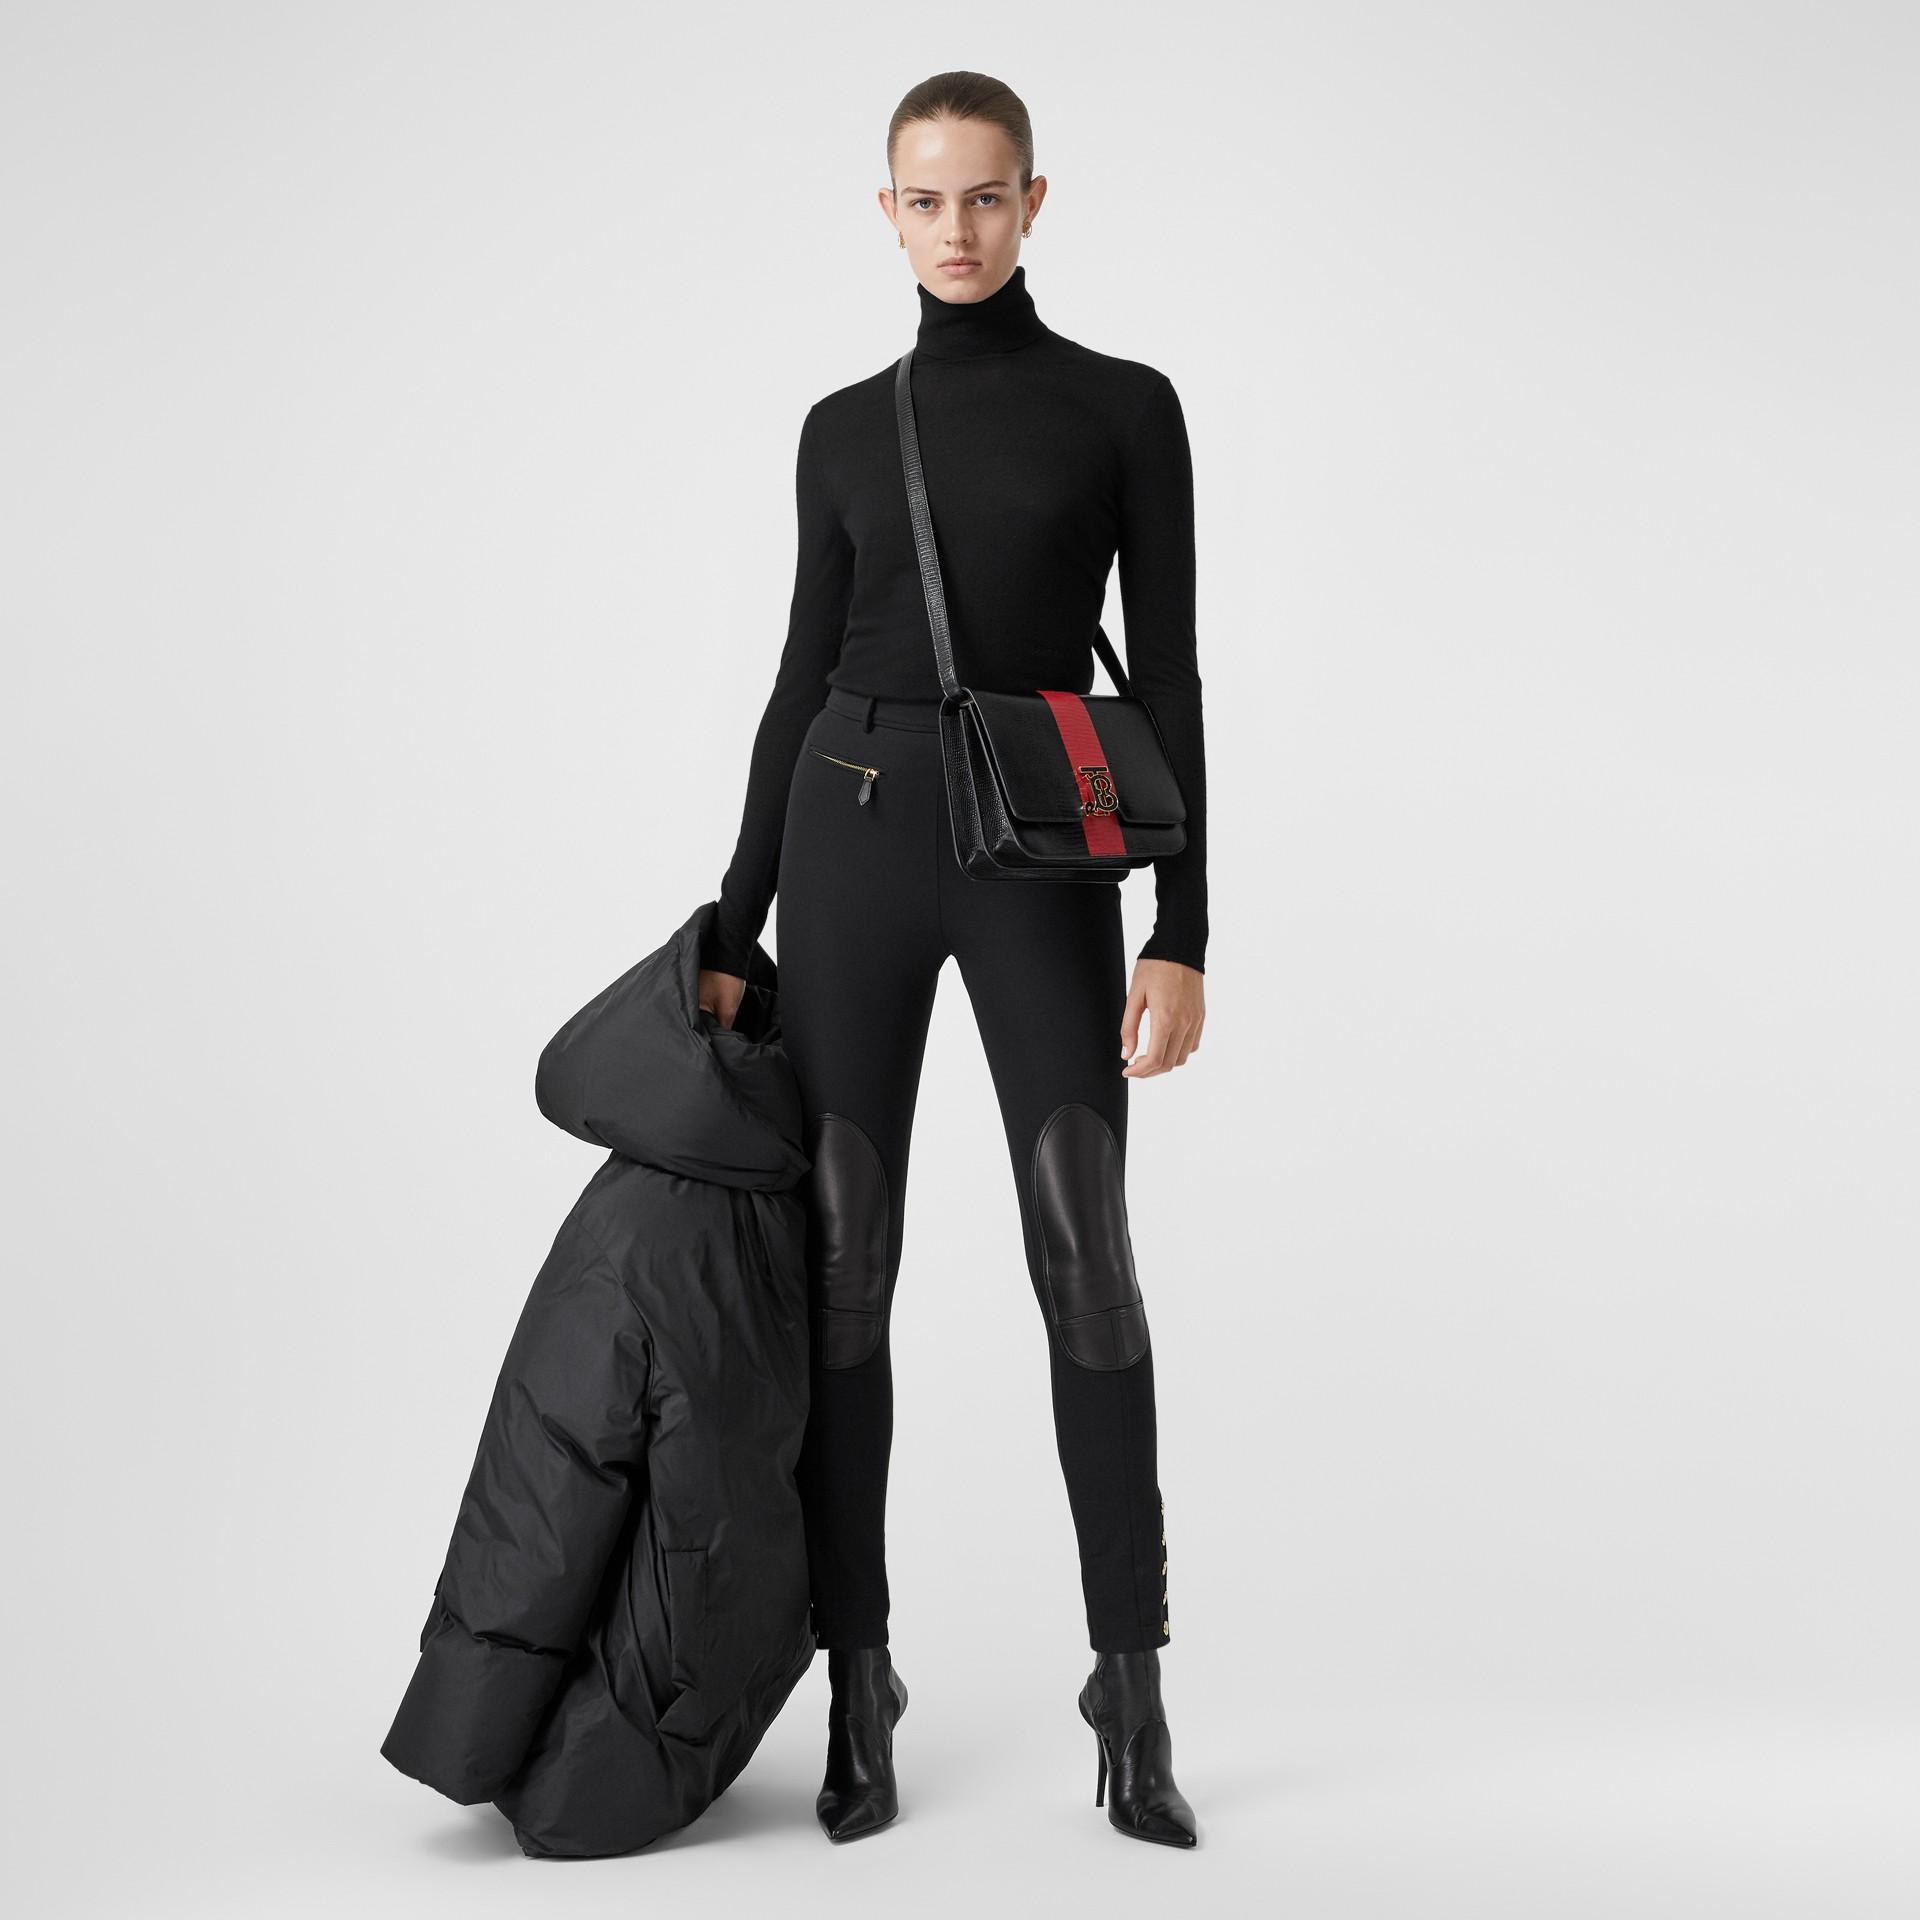 Lambskin Trim Stretch Cotton Blend Trousers in Black - Women | Burberry United Kingdom - gallery image 0